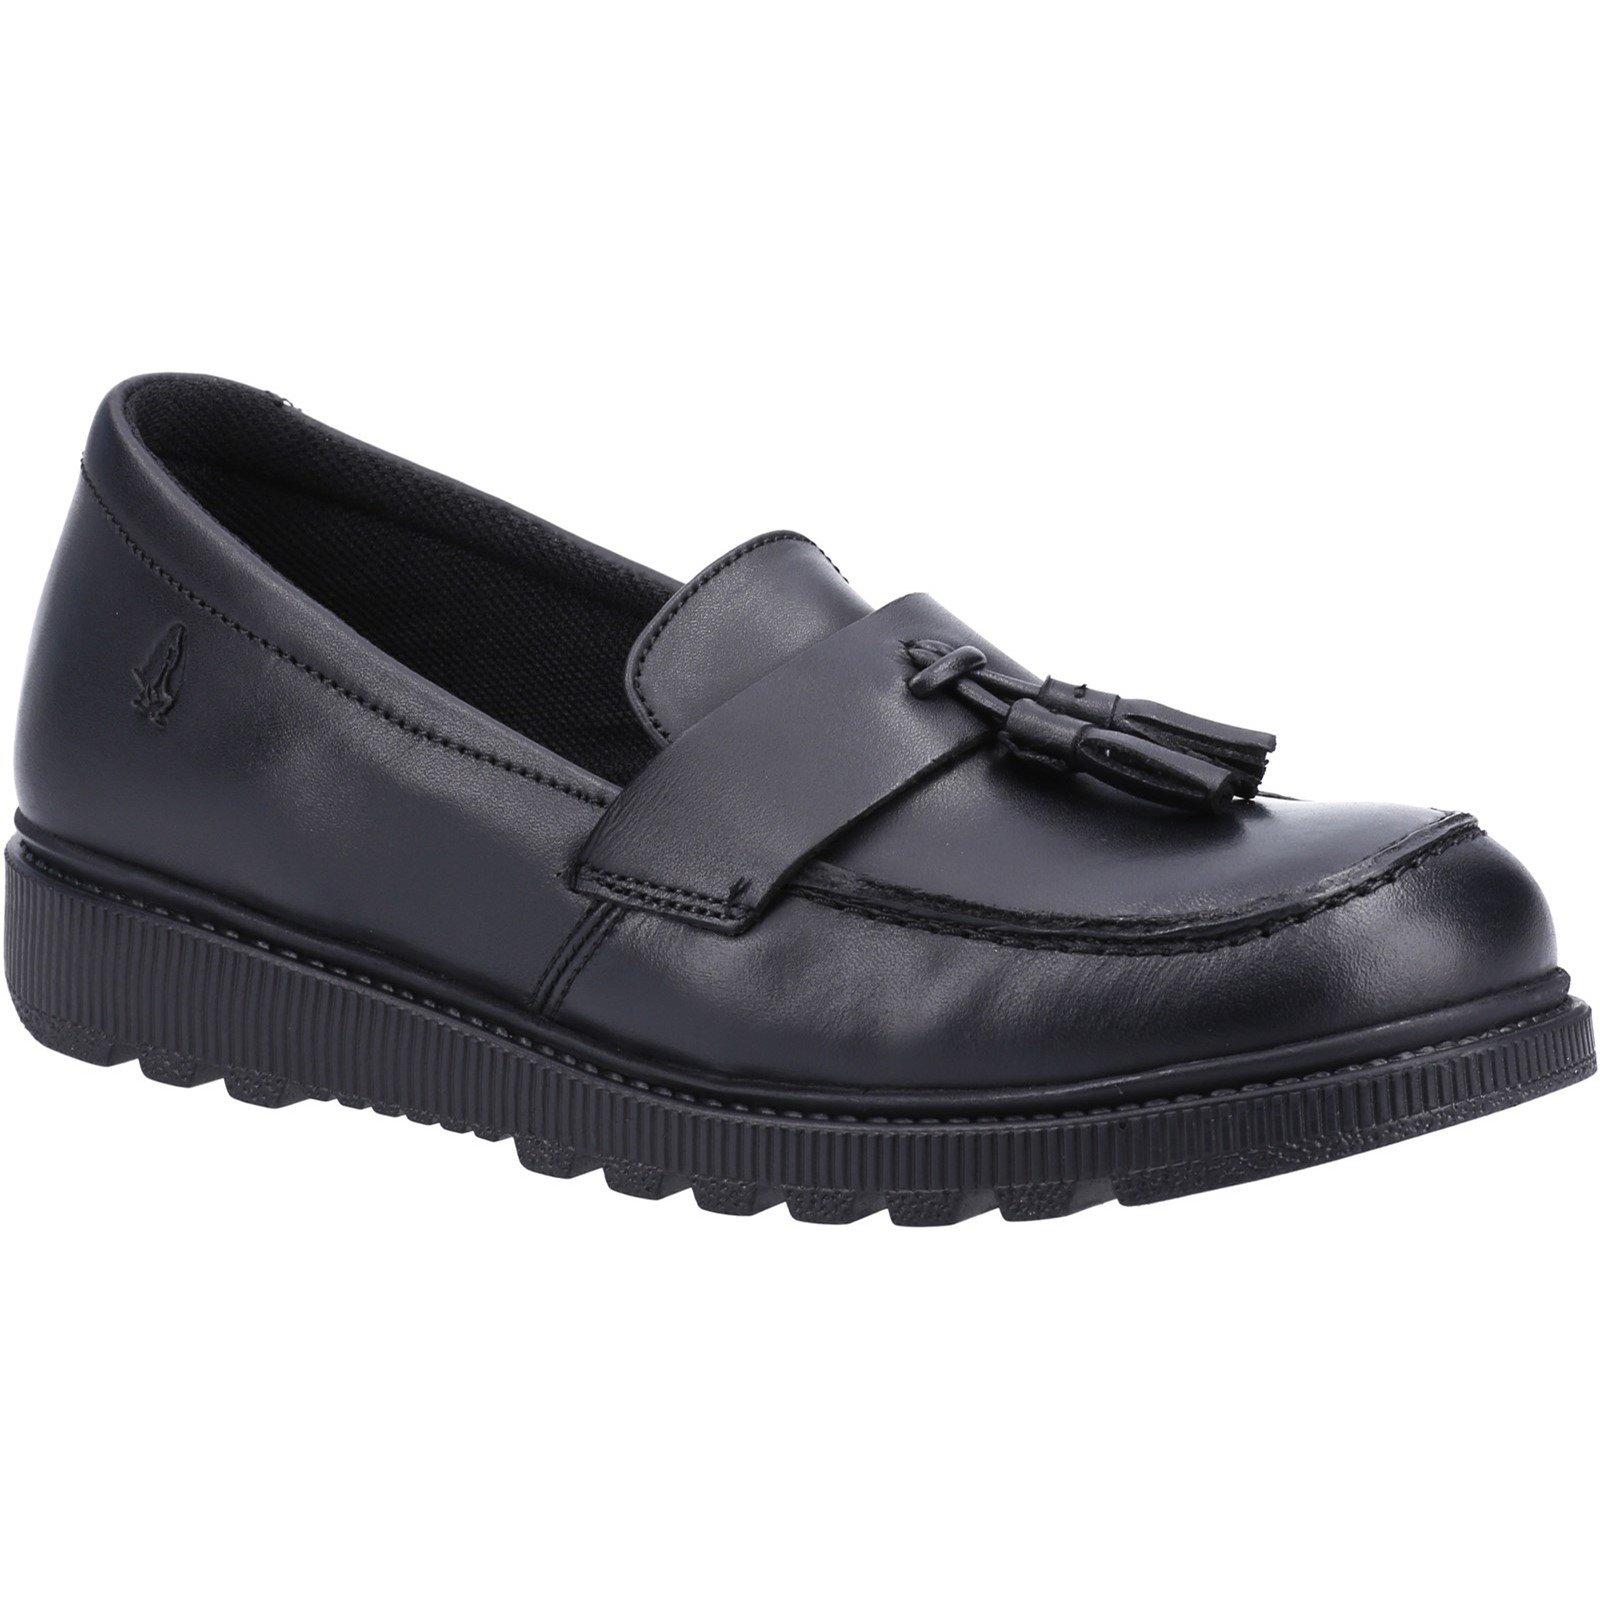 Hush Puppies Kid's Faye Senior School Shoe Patent Black 30844 - Patent Black 4